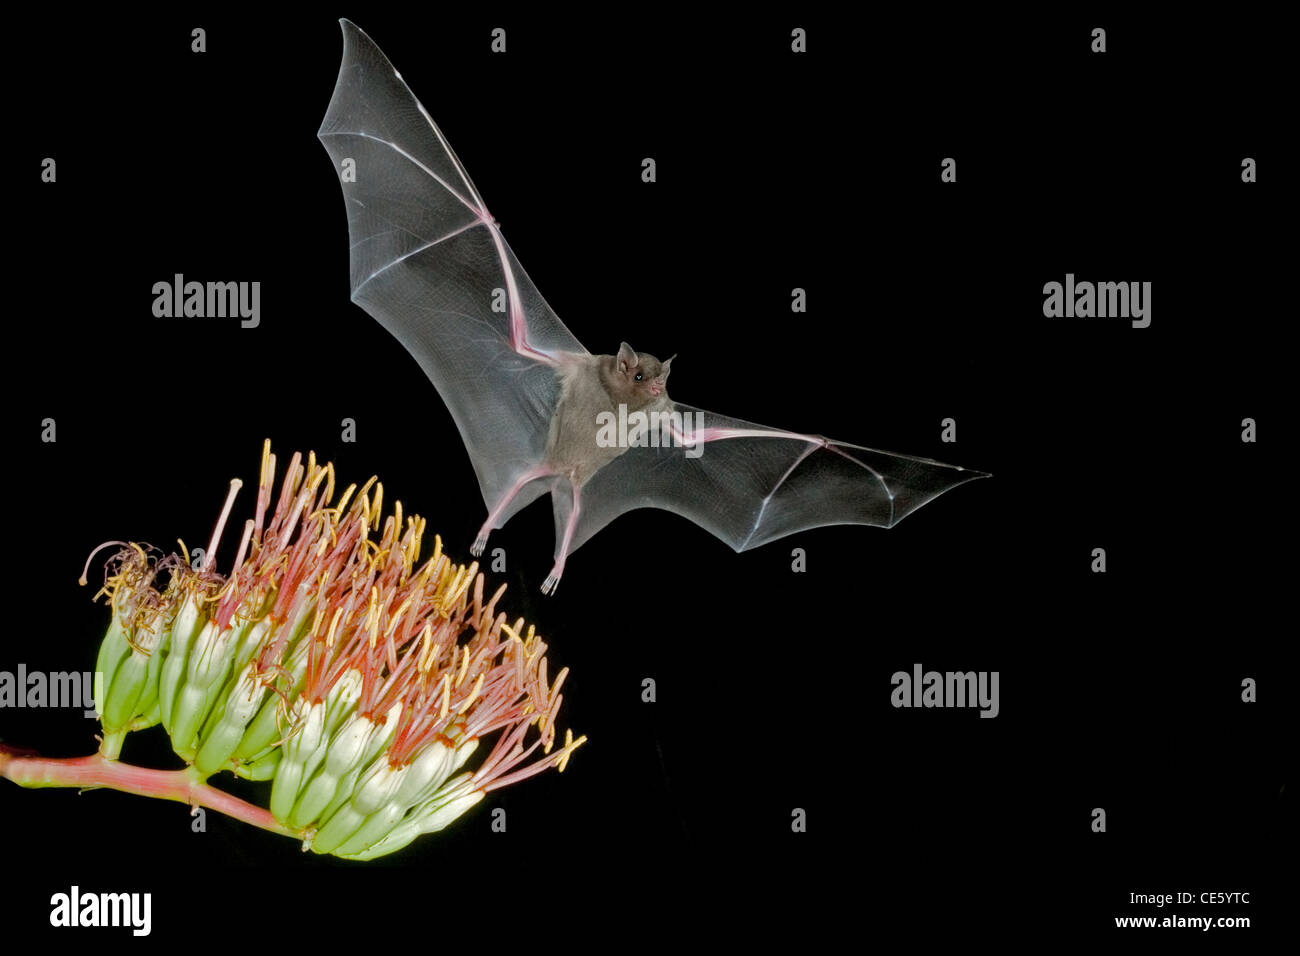 Geringerem langnasigen Bat Leptonycteris Curasoae Amado, ARIZONA, USA 23 August Erwachsenen Parrys Agave Blumen. Stockfoto